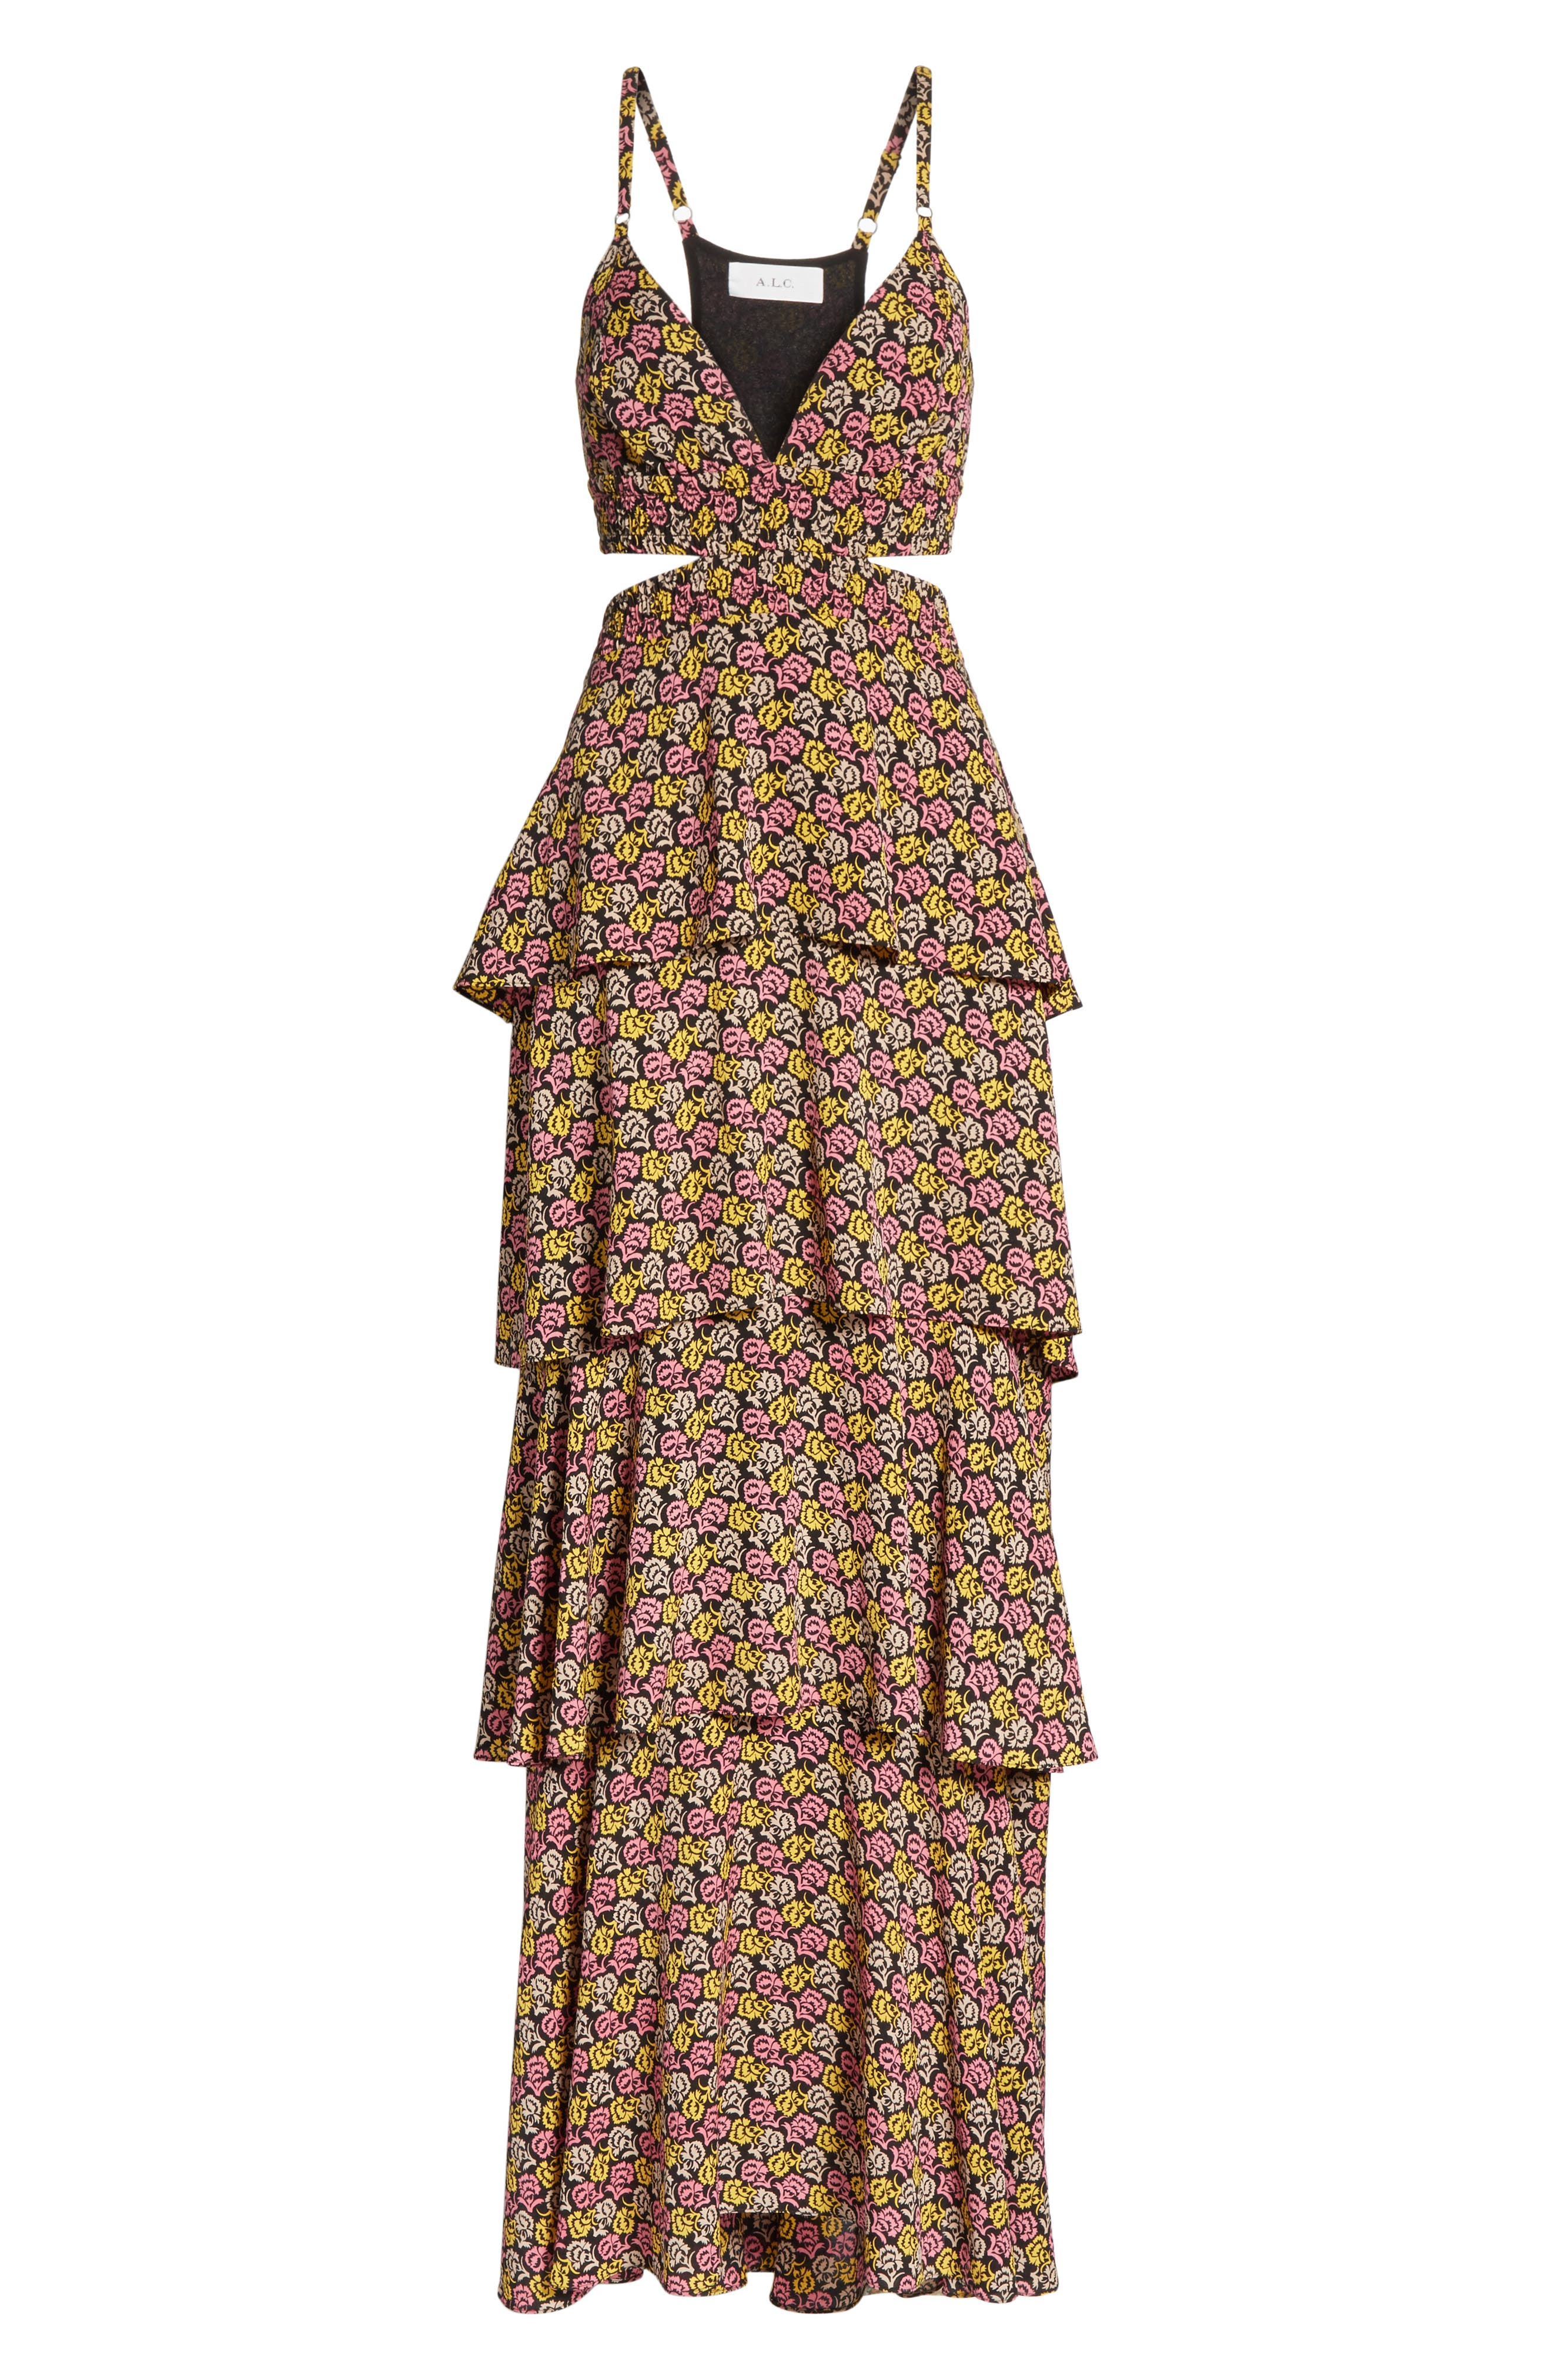 Titus Print Silk Tiered Maxi Dress,                             Alternate thumbnail 6, color,                             651